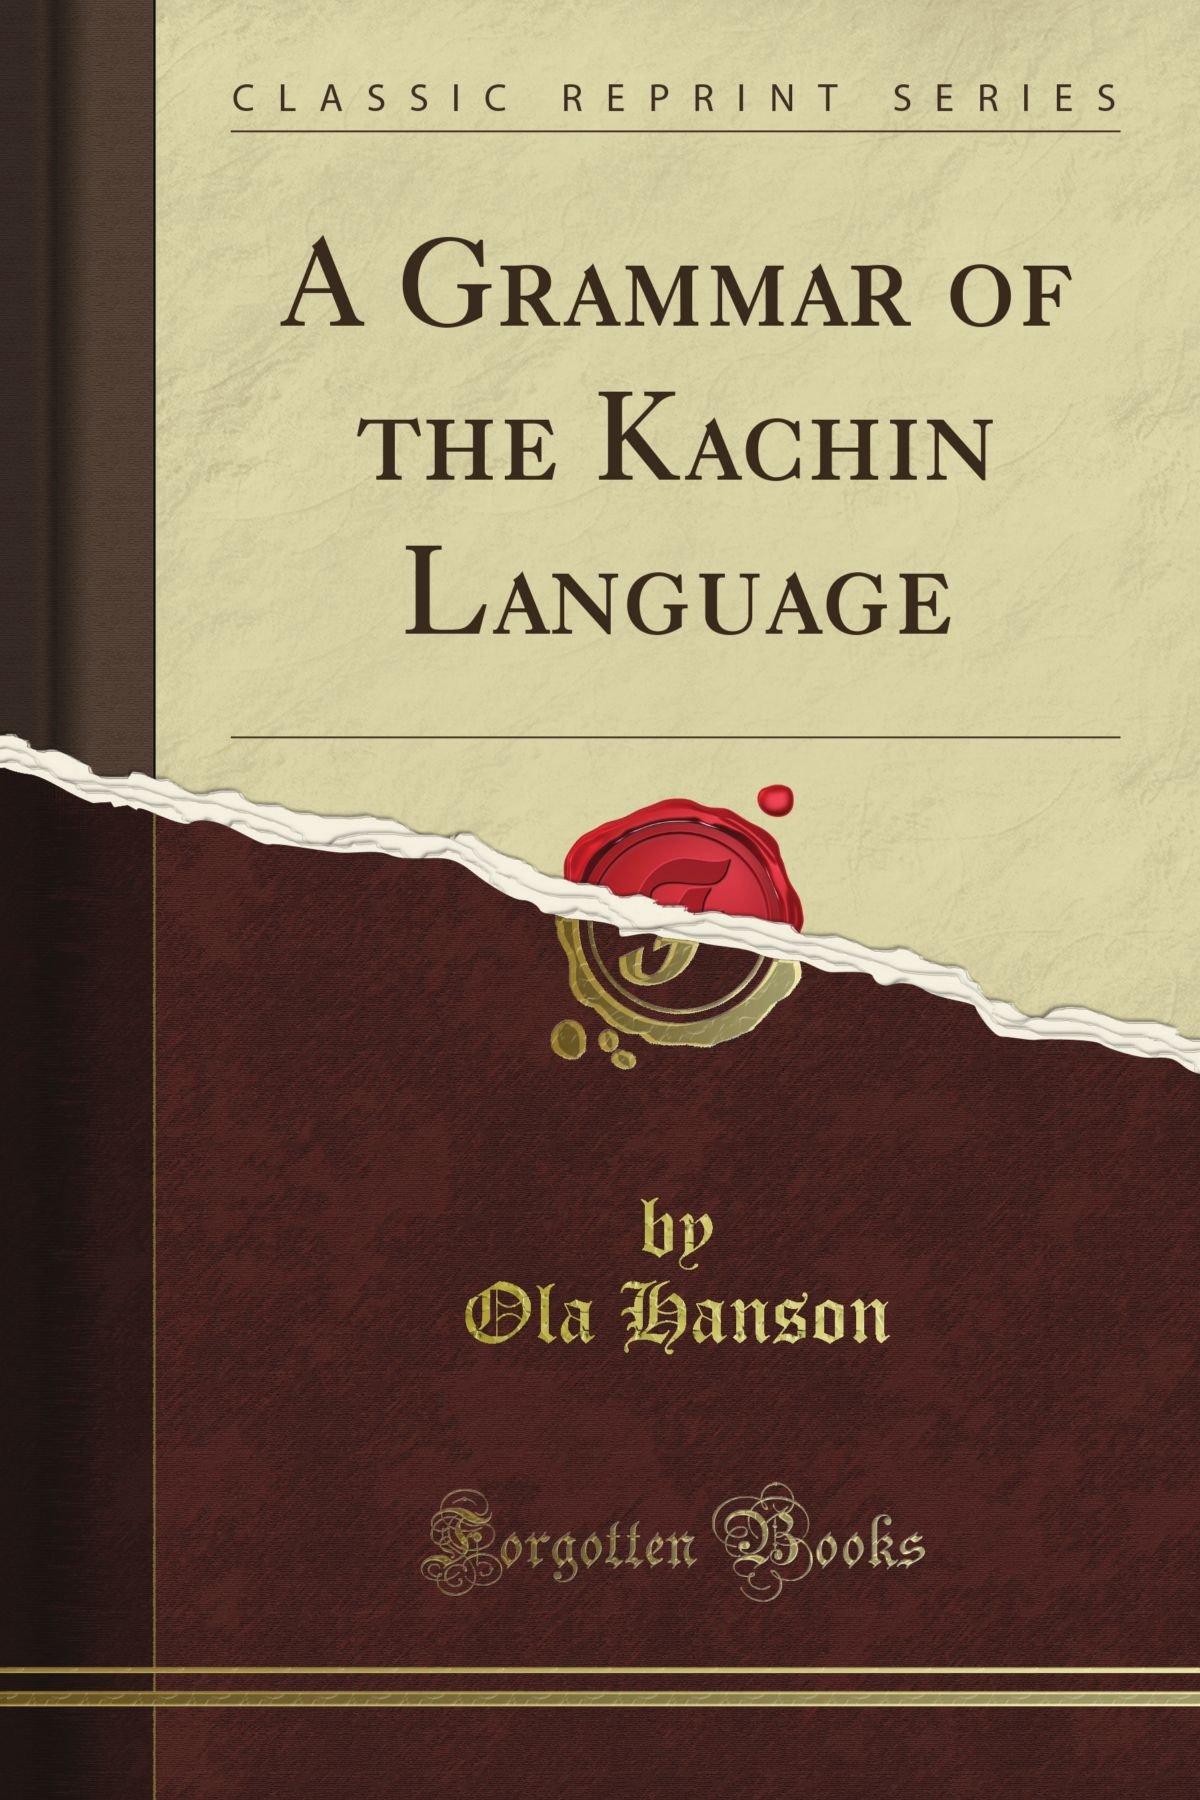 A Grammar of the Kachin Language (Classic Reprint) by Forgotten Books